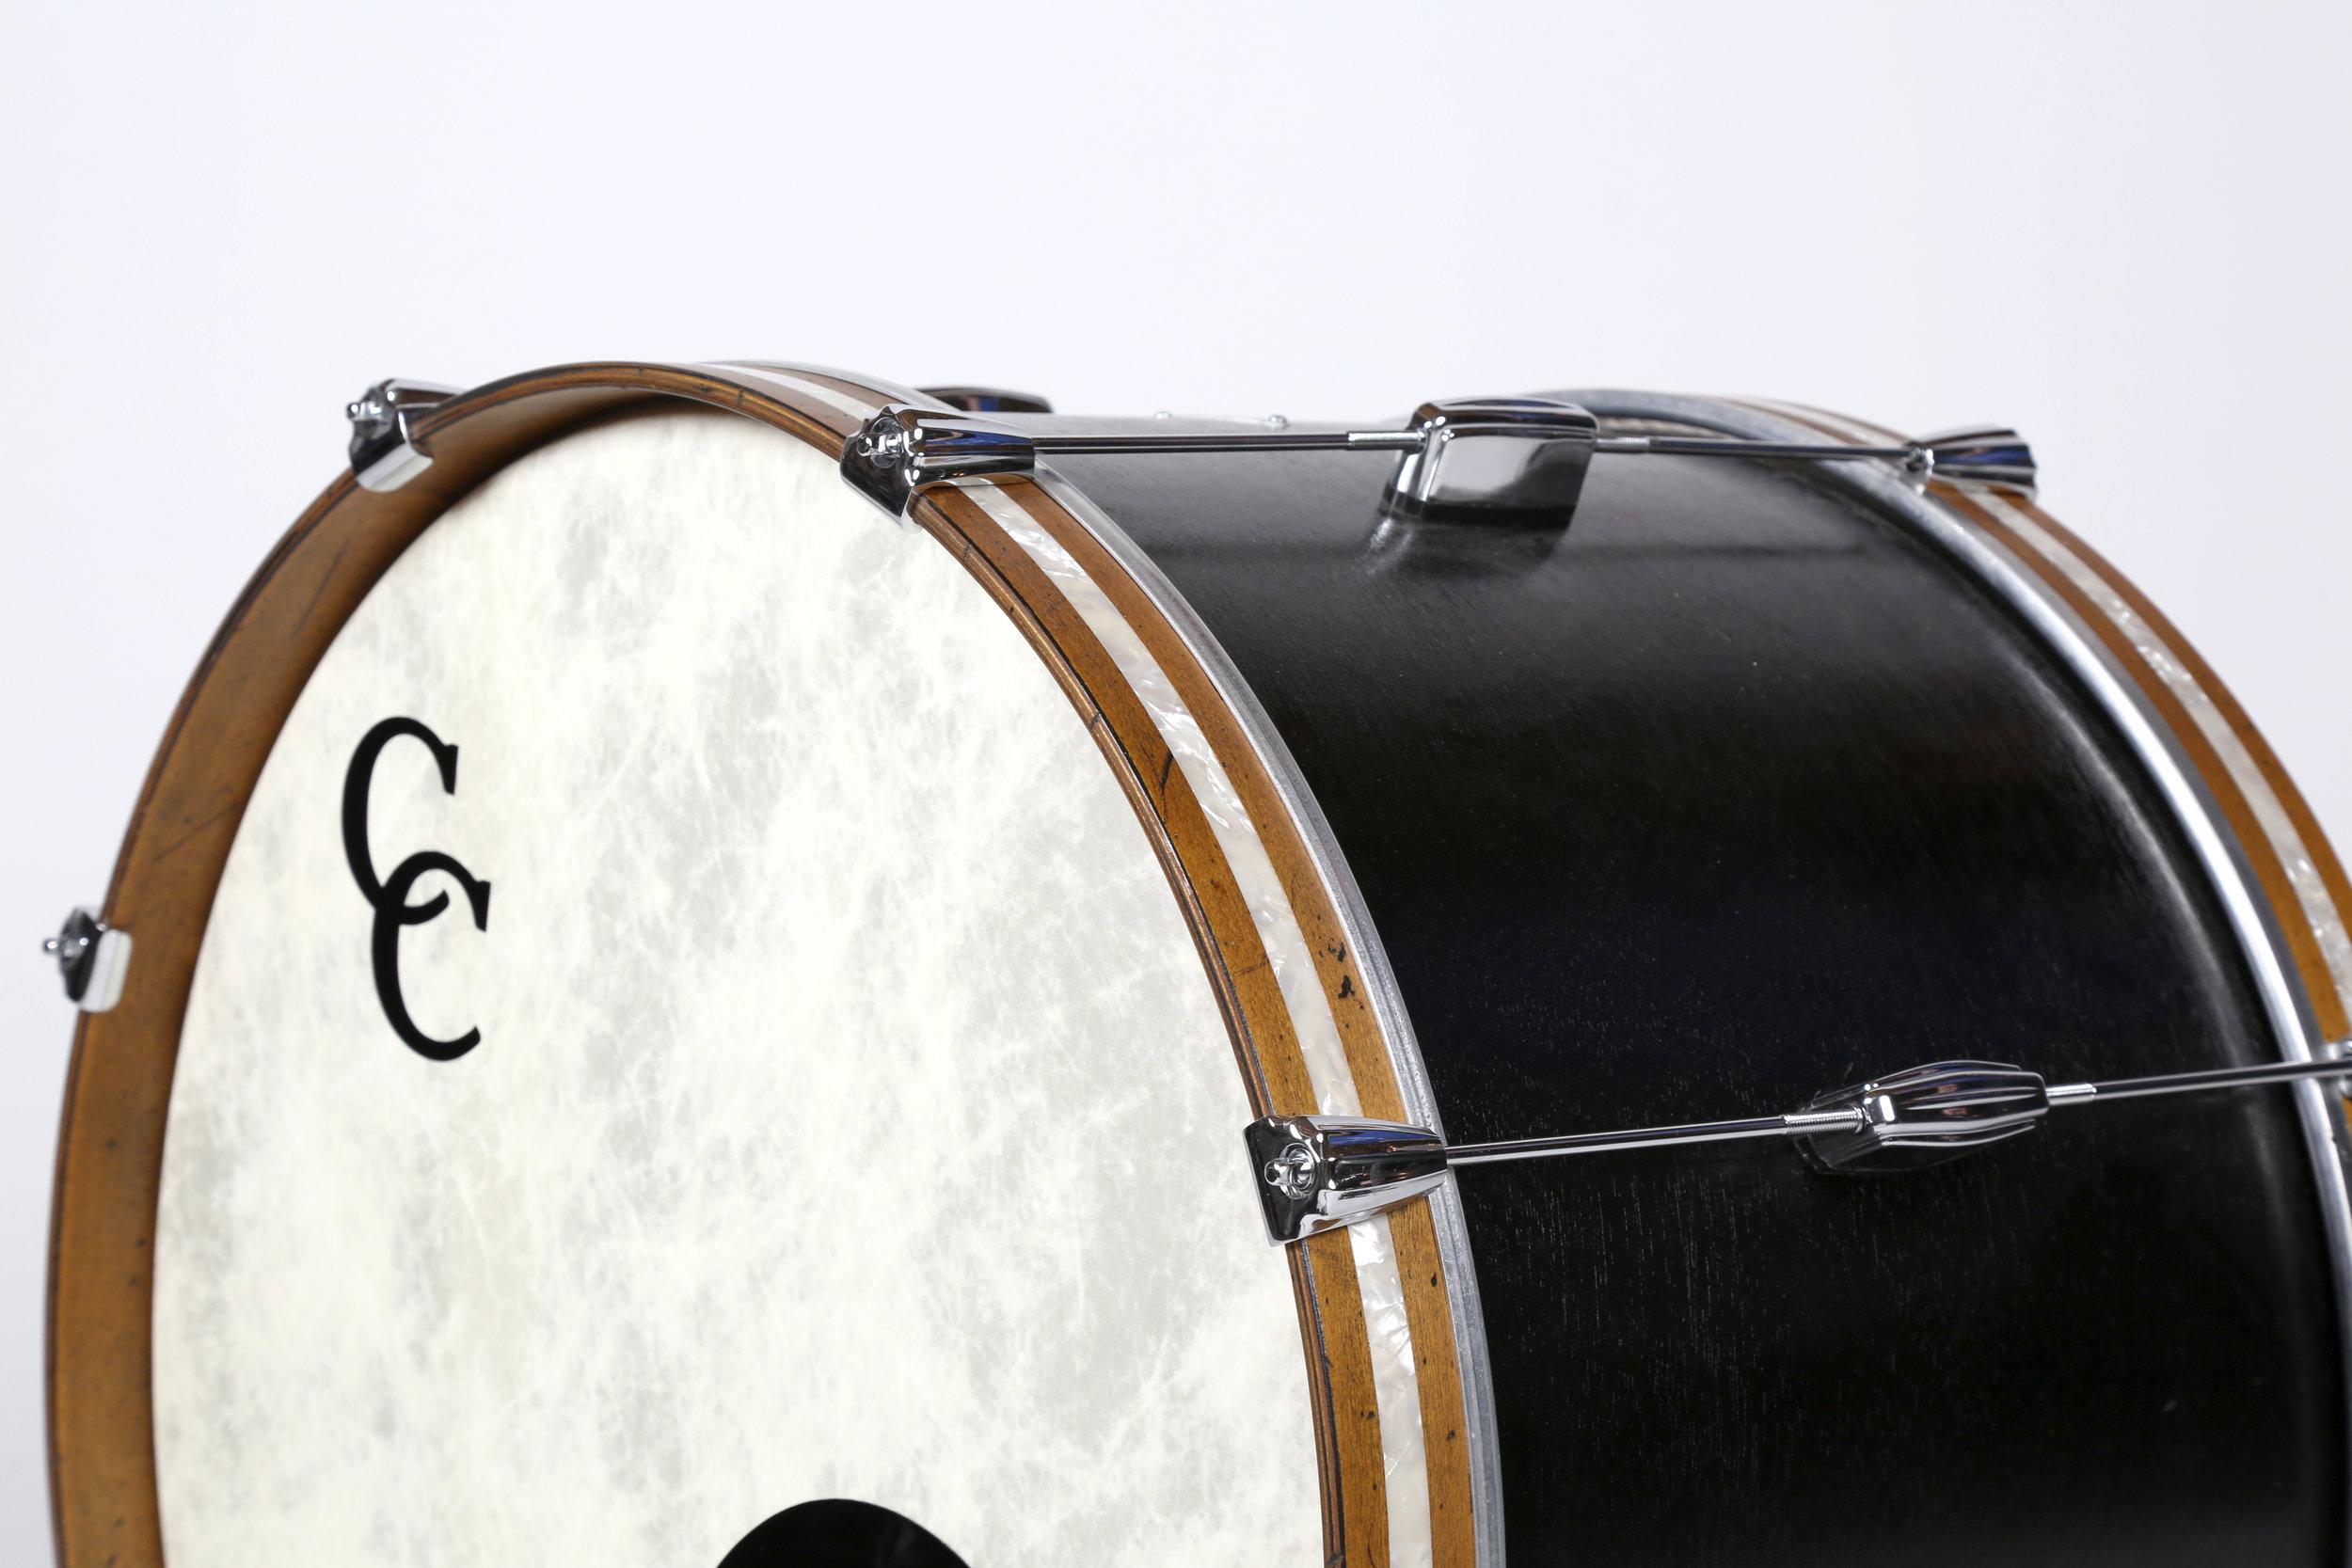 Dorio Vintage Drum_C&C Big Red_1981.jpg